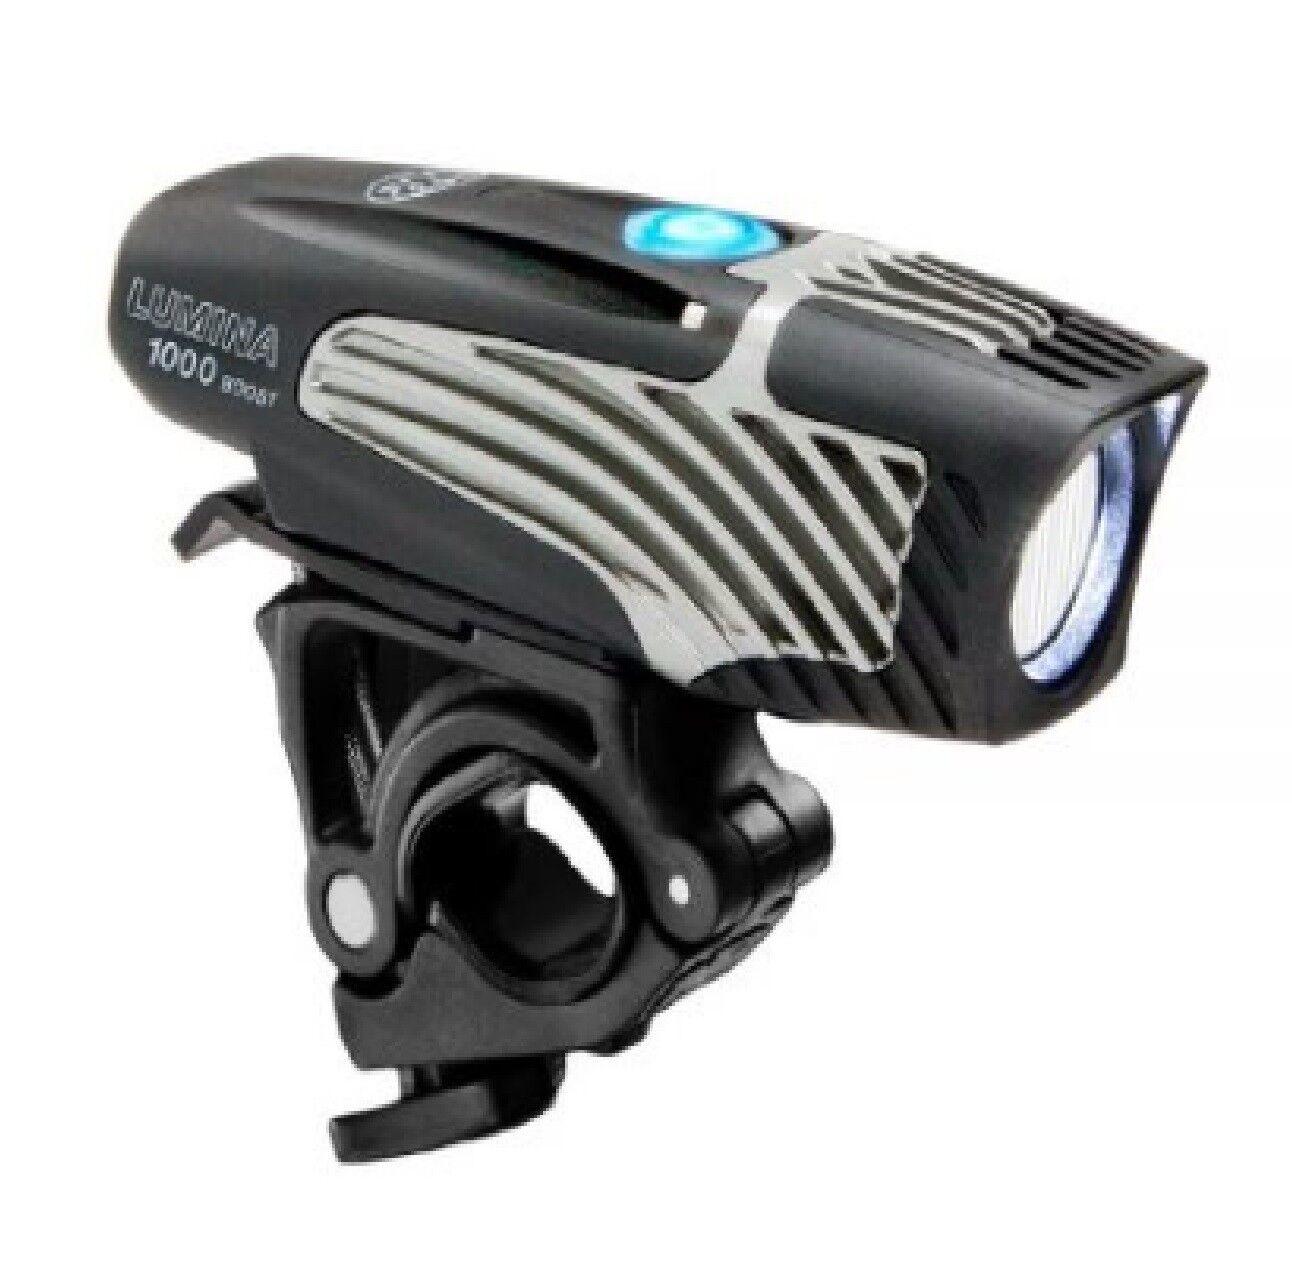 Niterider Lumina 1000 boost Road MTB Commute Front Cycling Light 18 19 (6782)